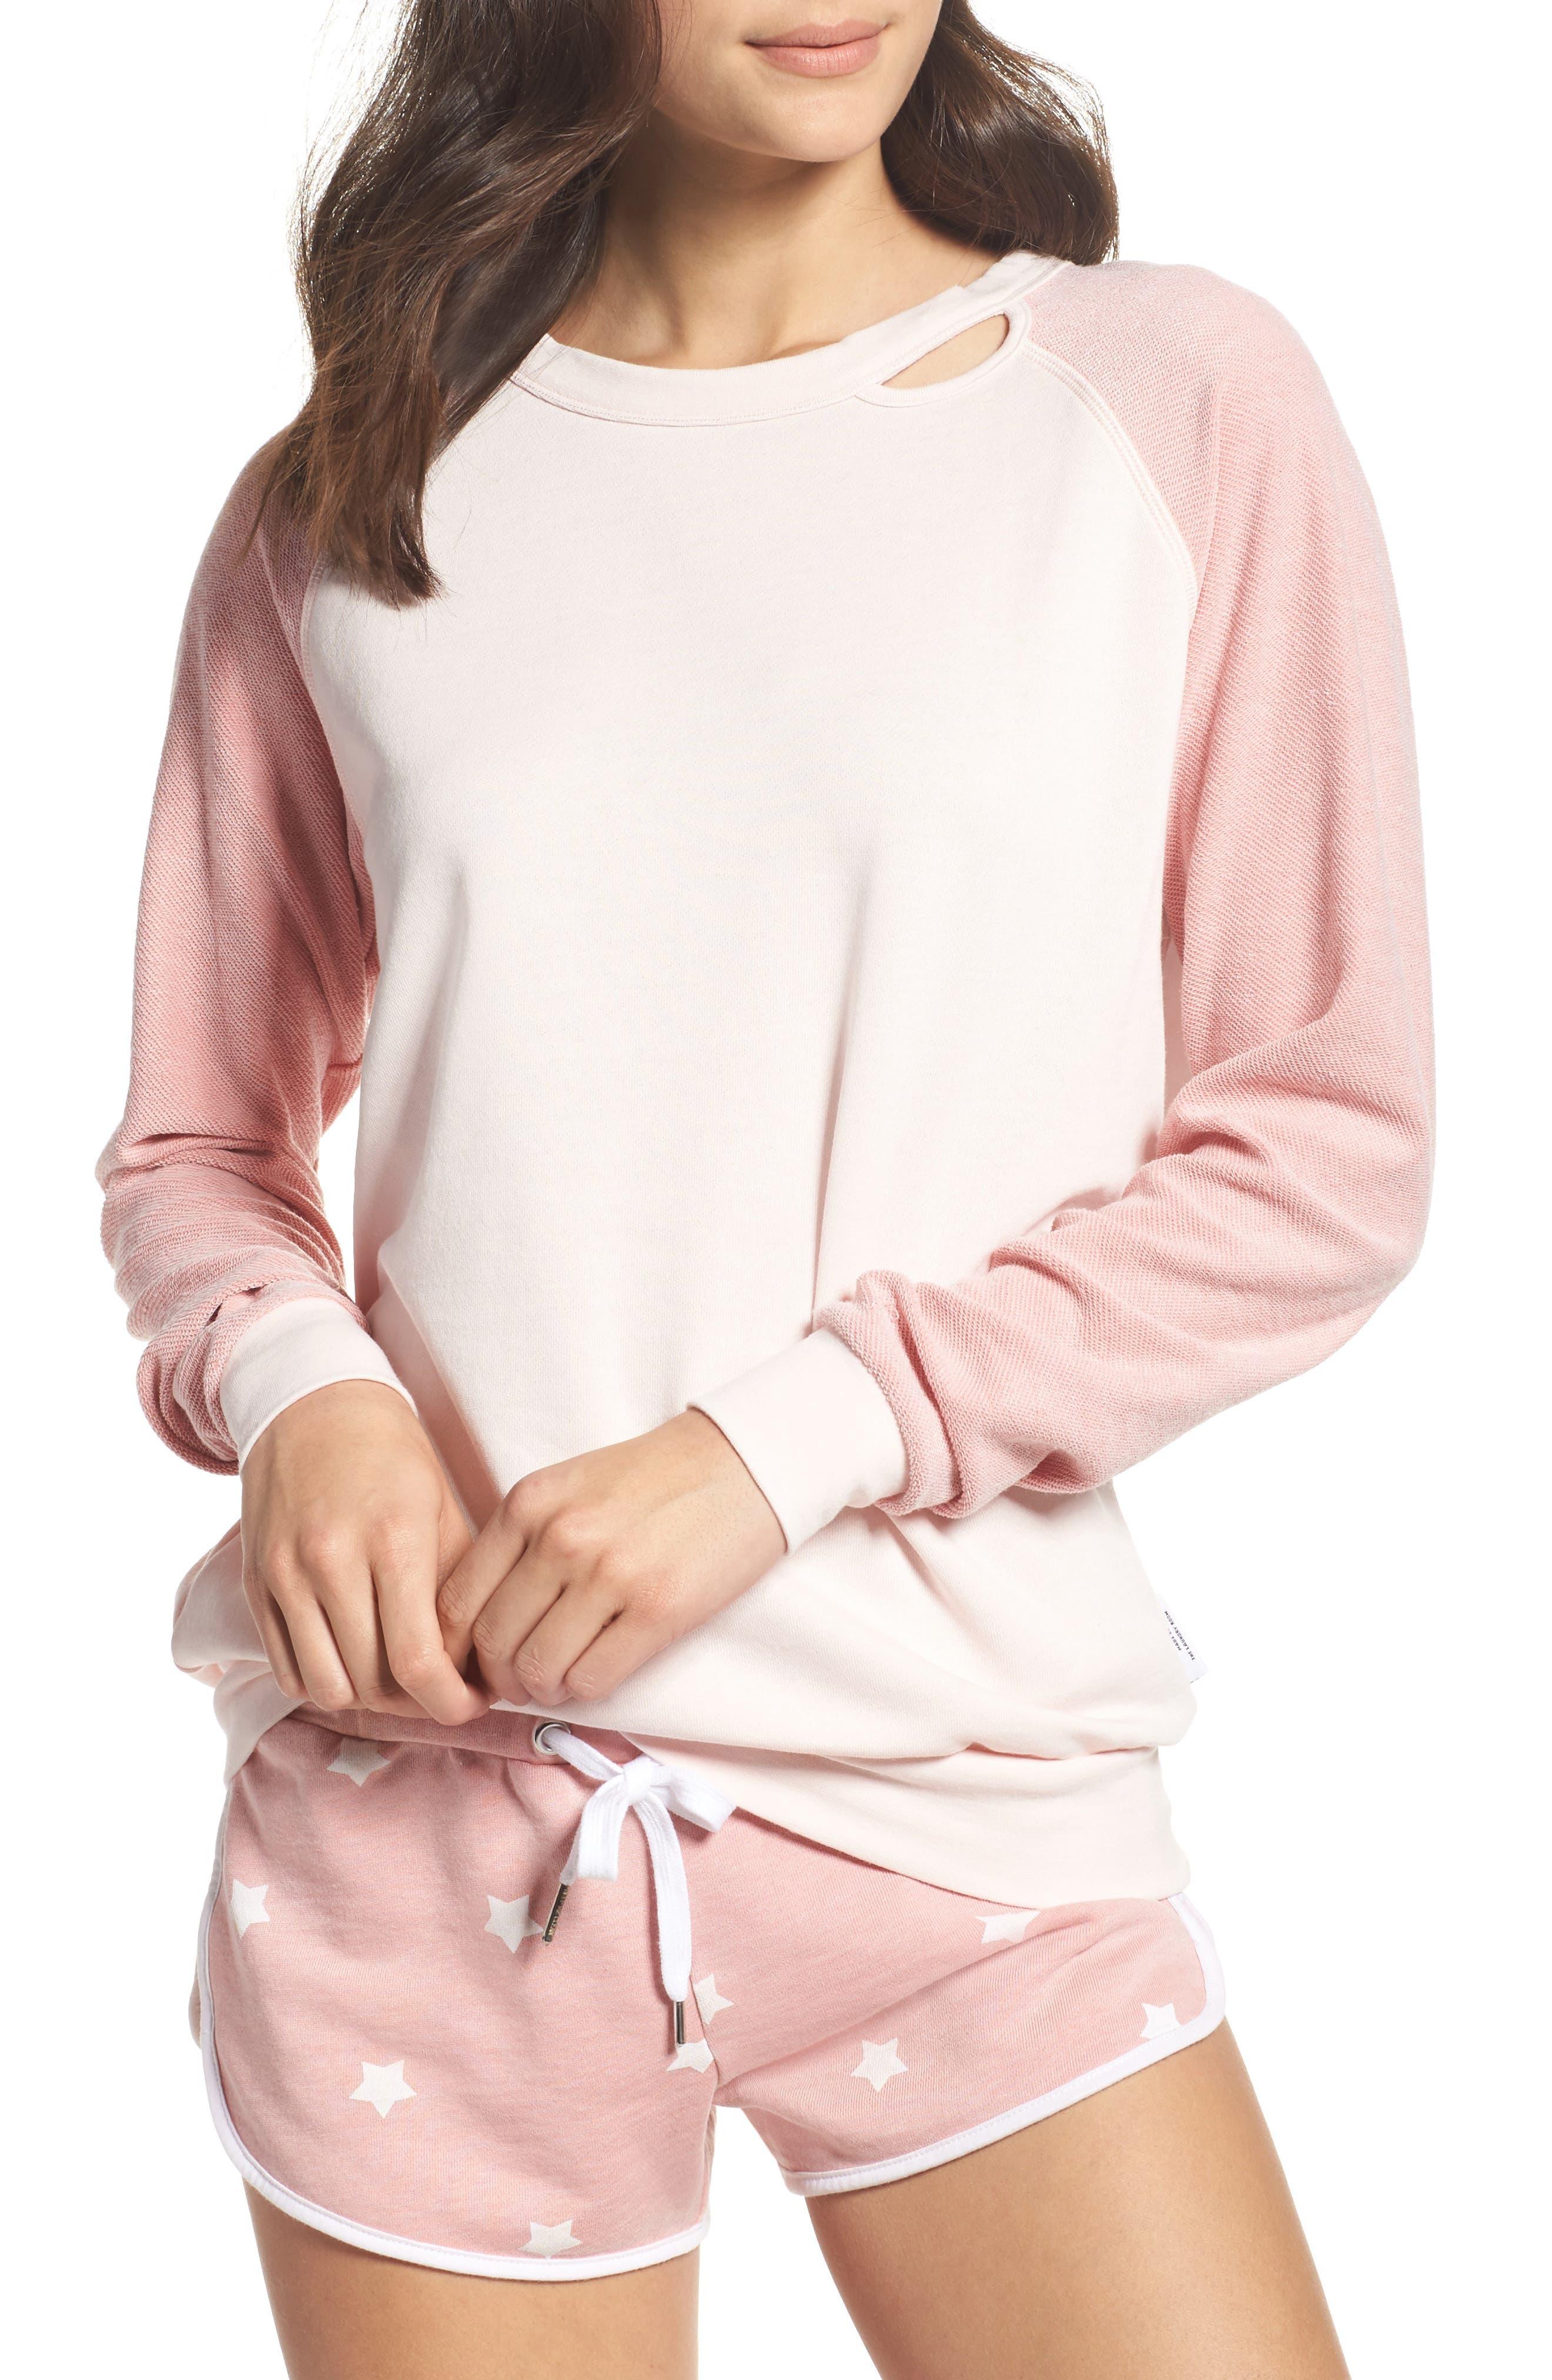 Bander Sweatshirt,                         Main,                         color, Champagne / Shell